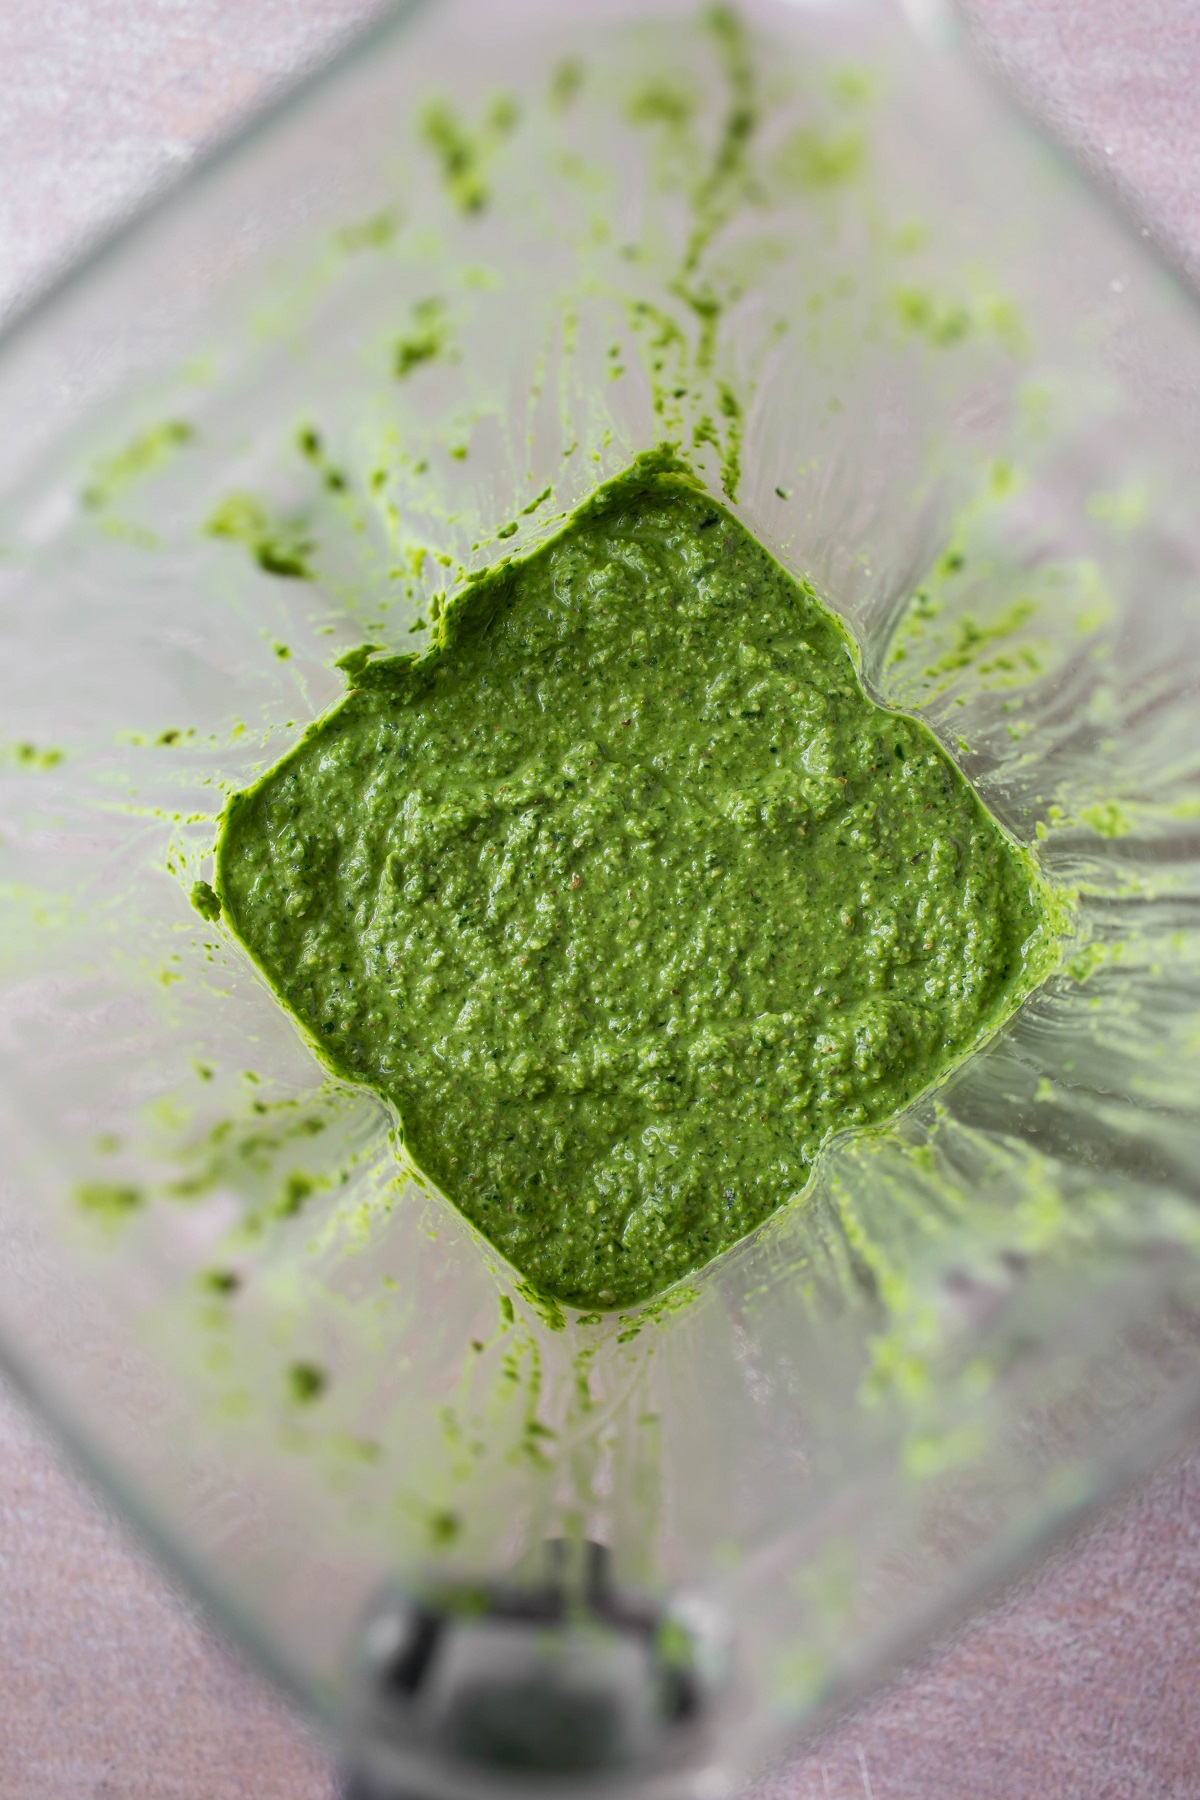 vegan spinach pesto in vitamix blended up